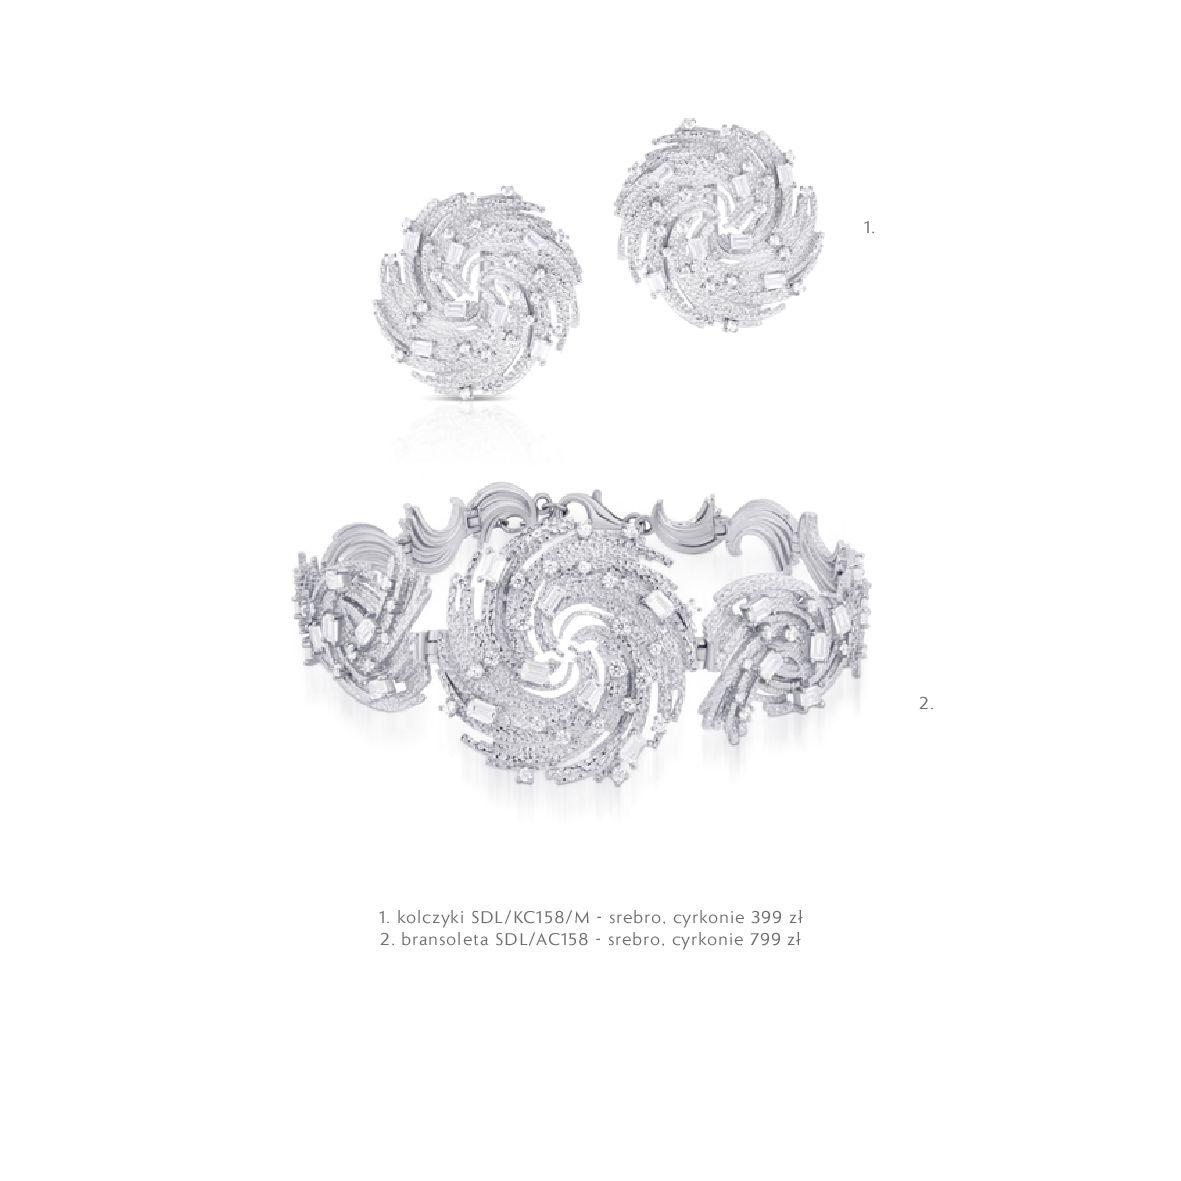 Gazetka W. KRUK: Katalog - Kolekcja Blask 2021-02-17 page-19